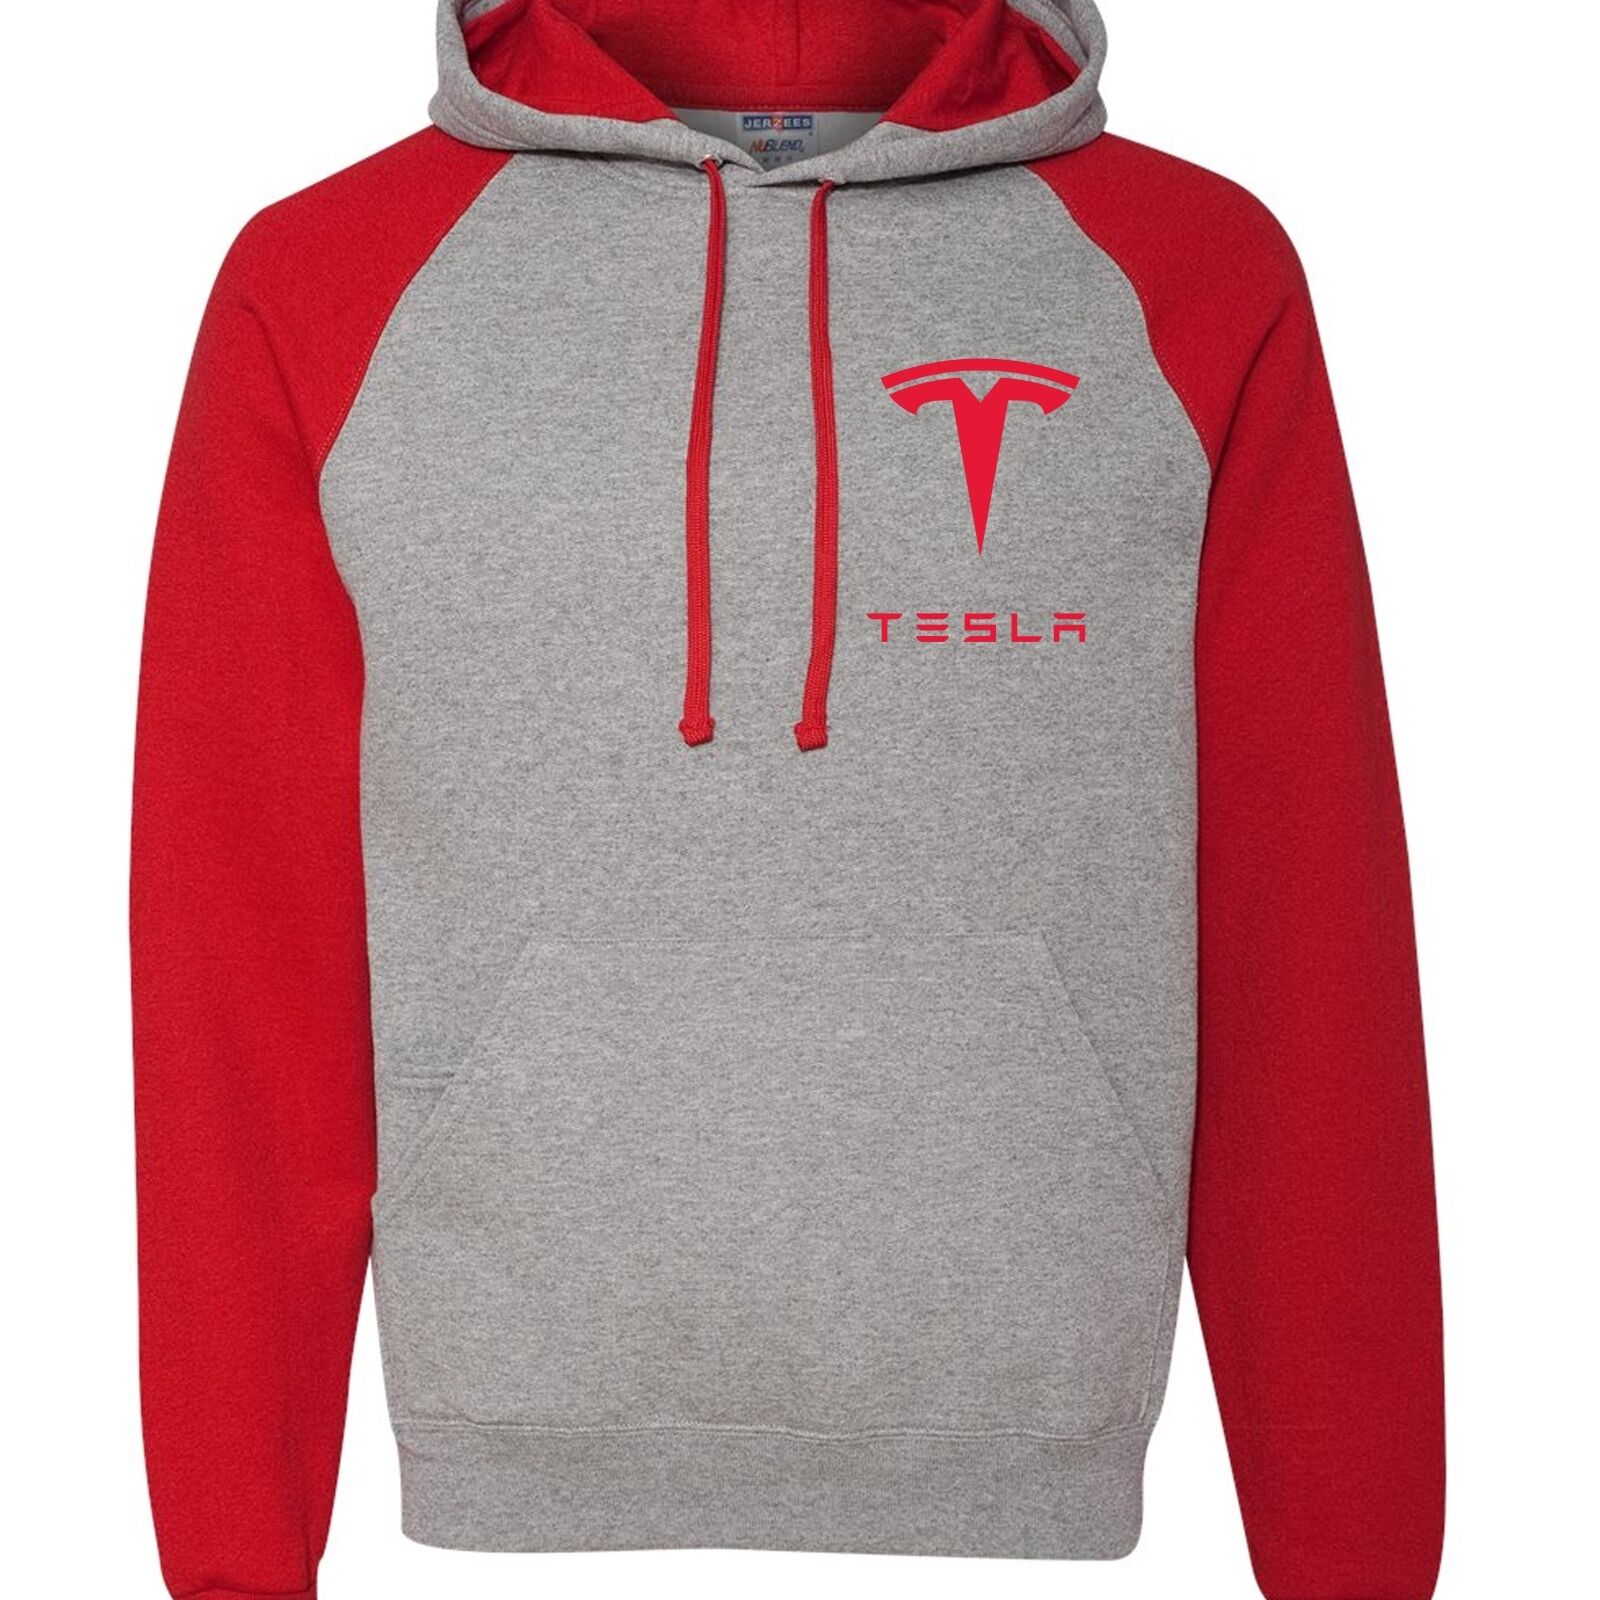 RED GREY Hooded Sweatshirt TESLA Model 3 Car Free Shipping Embroidery or Vinyl